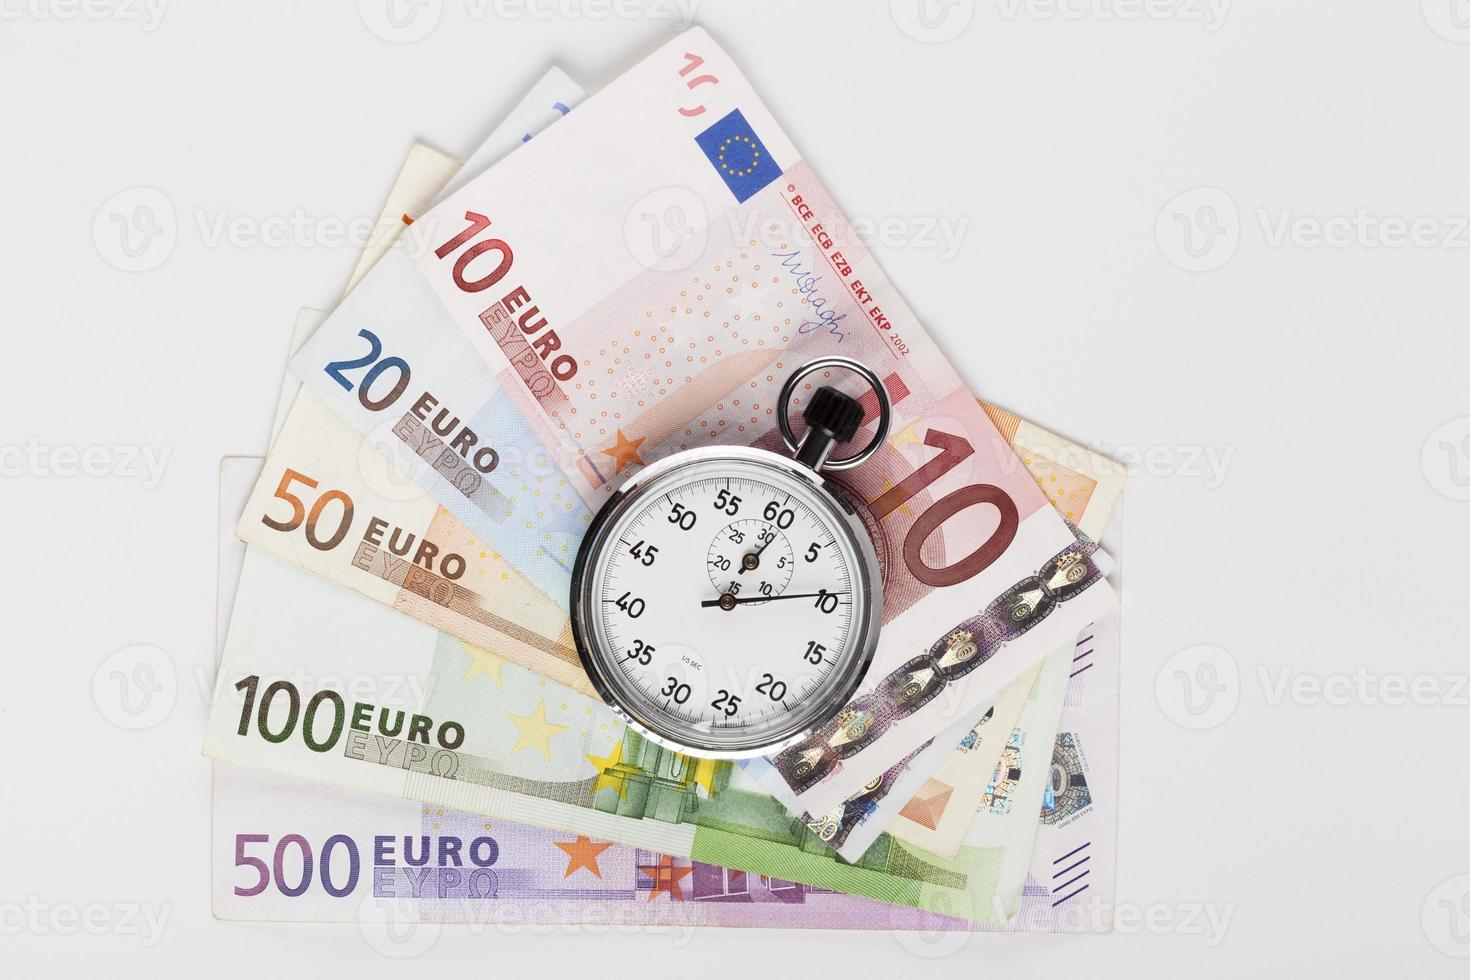 tempo de euros foto